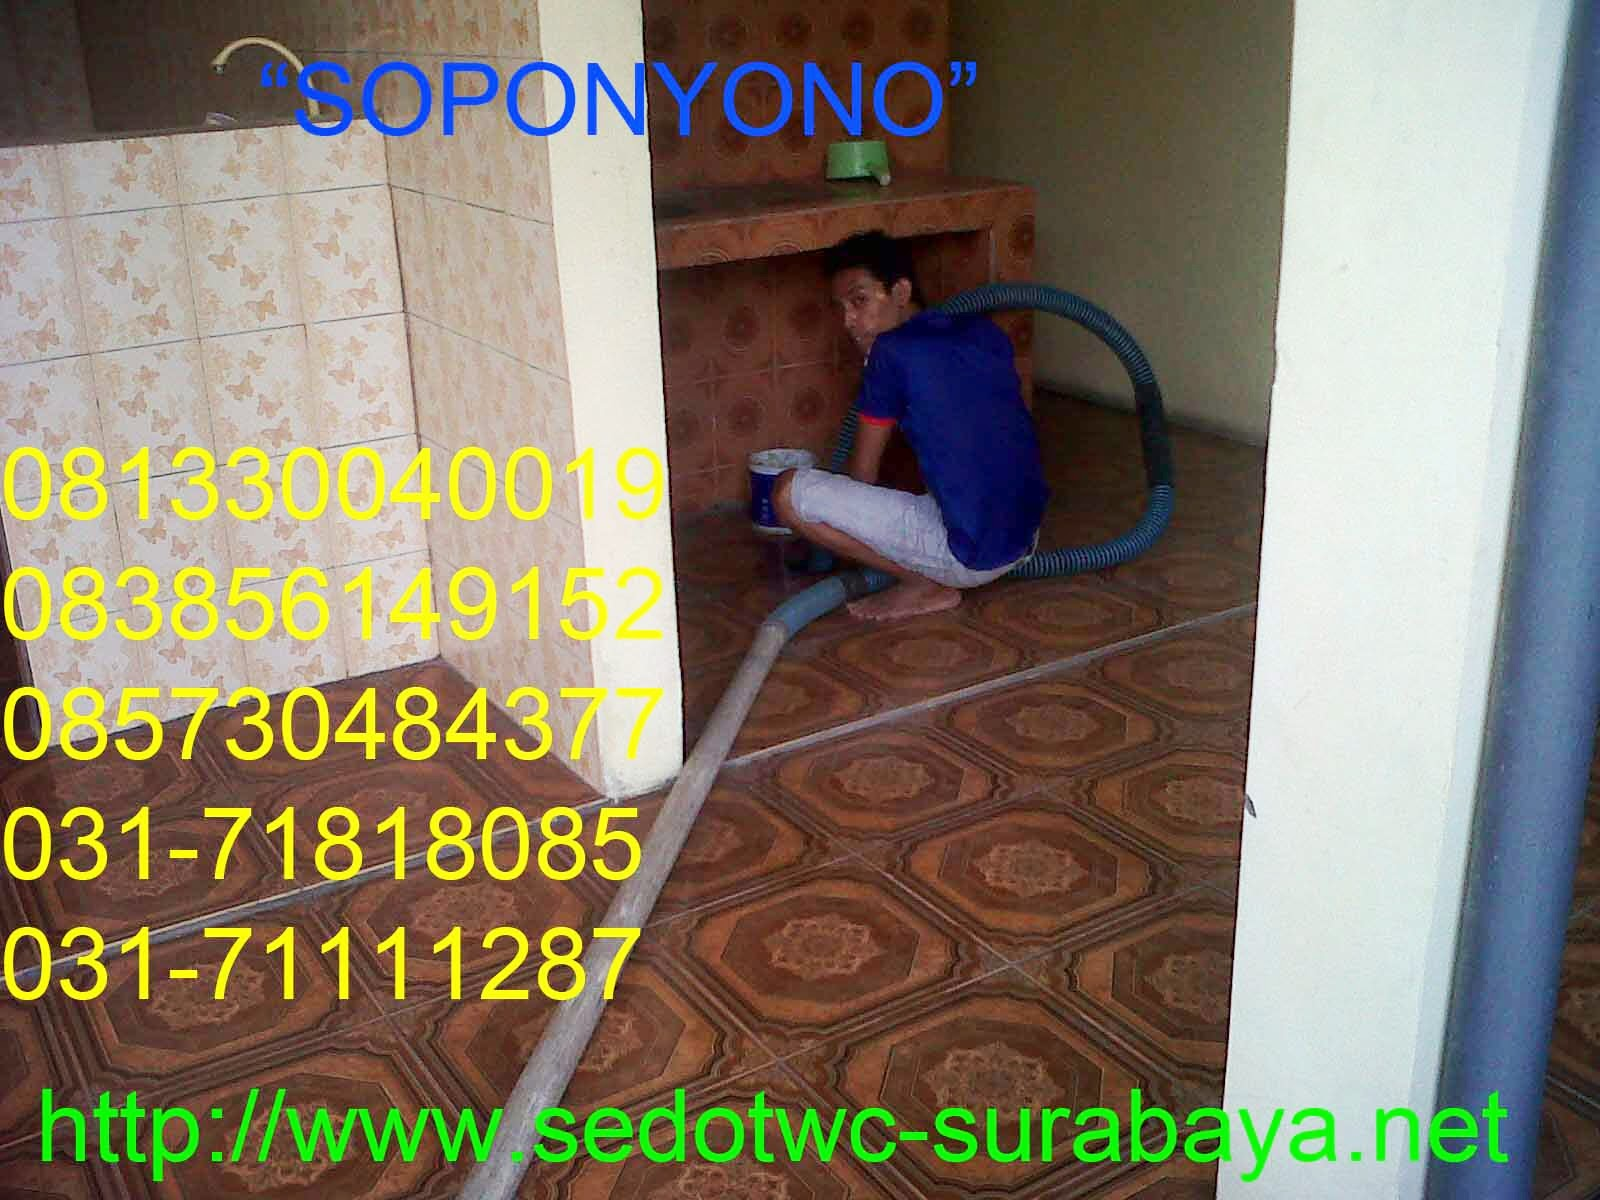 Sedot WC Tegalsari Surabaya Online | Call 085732358519